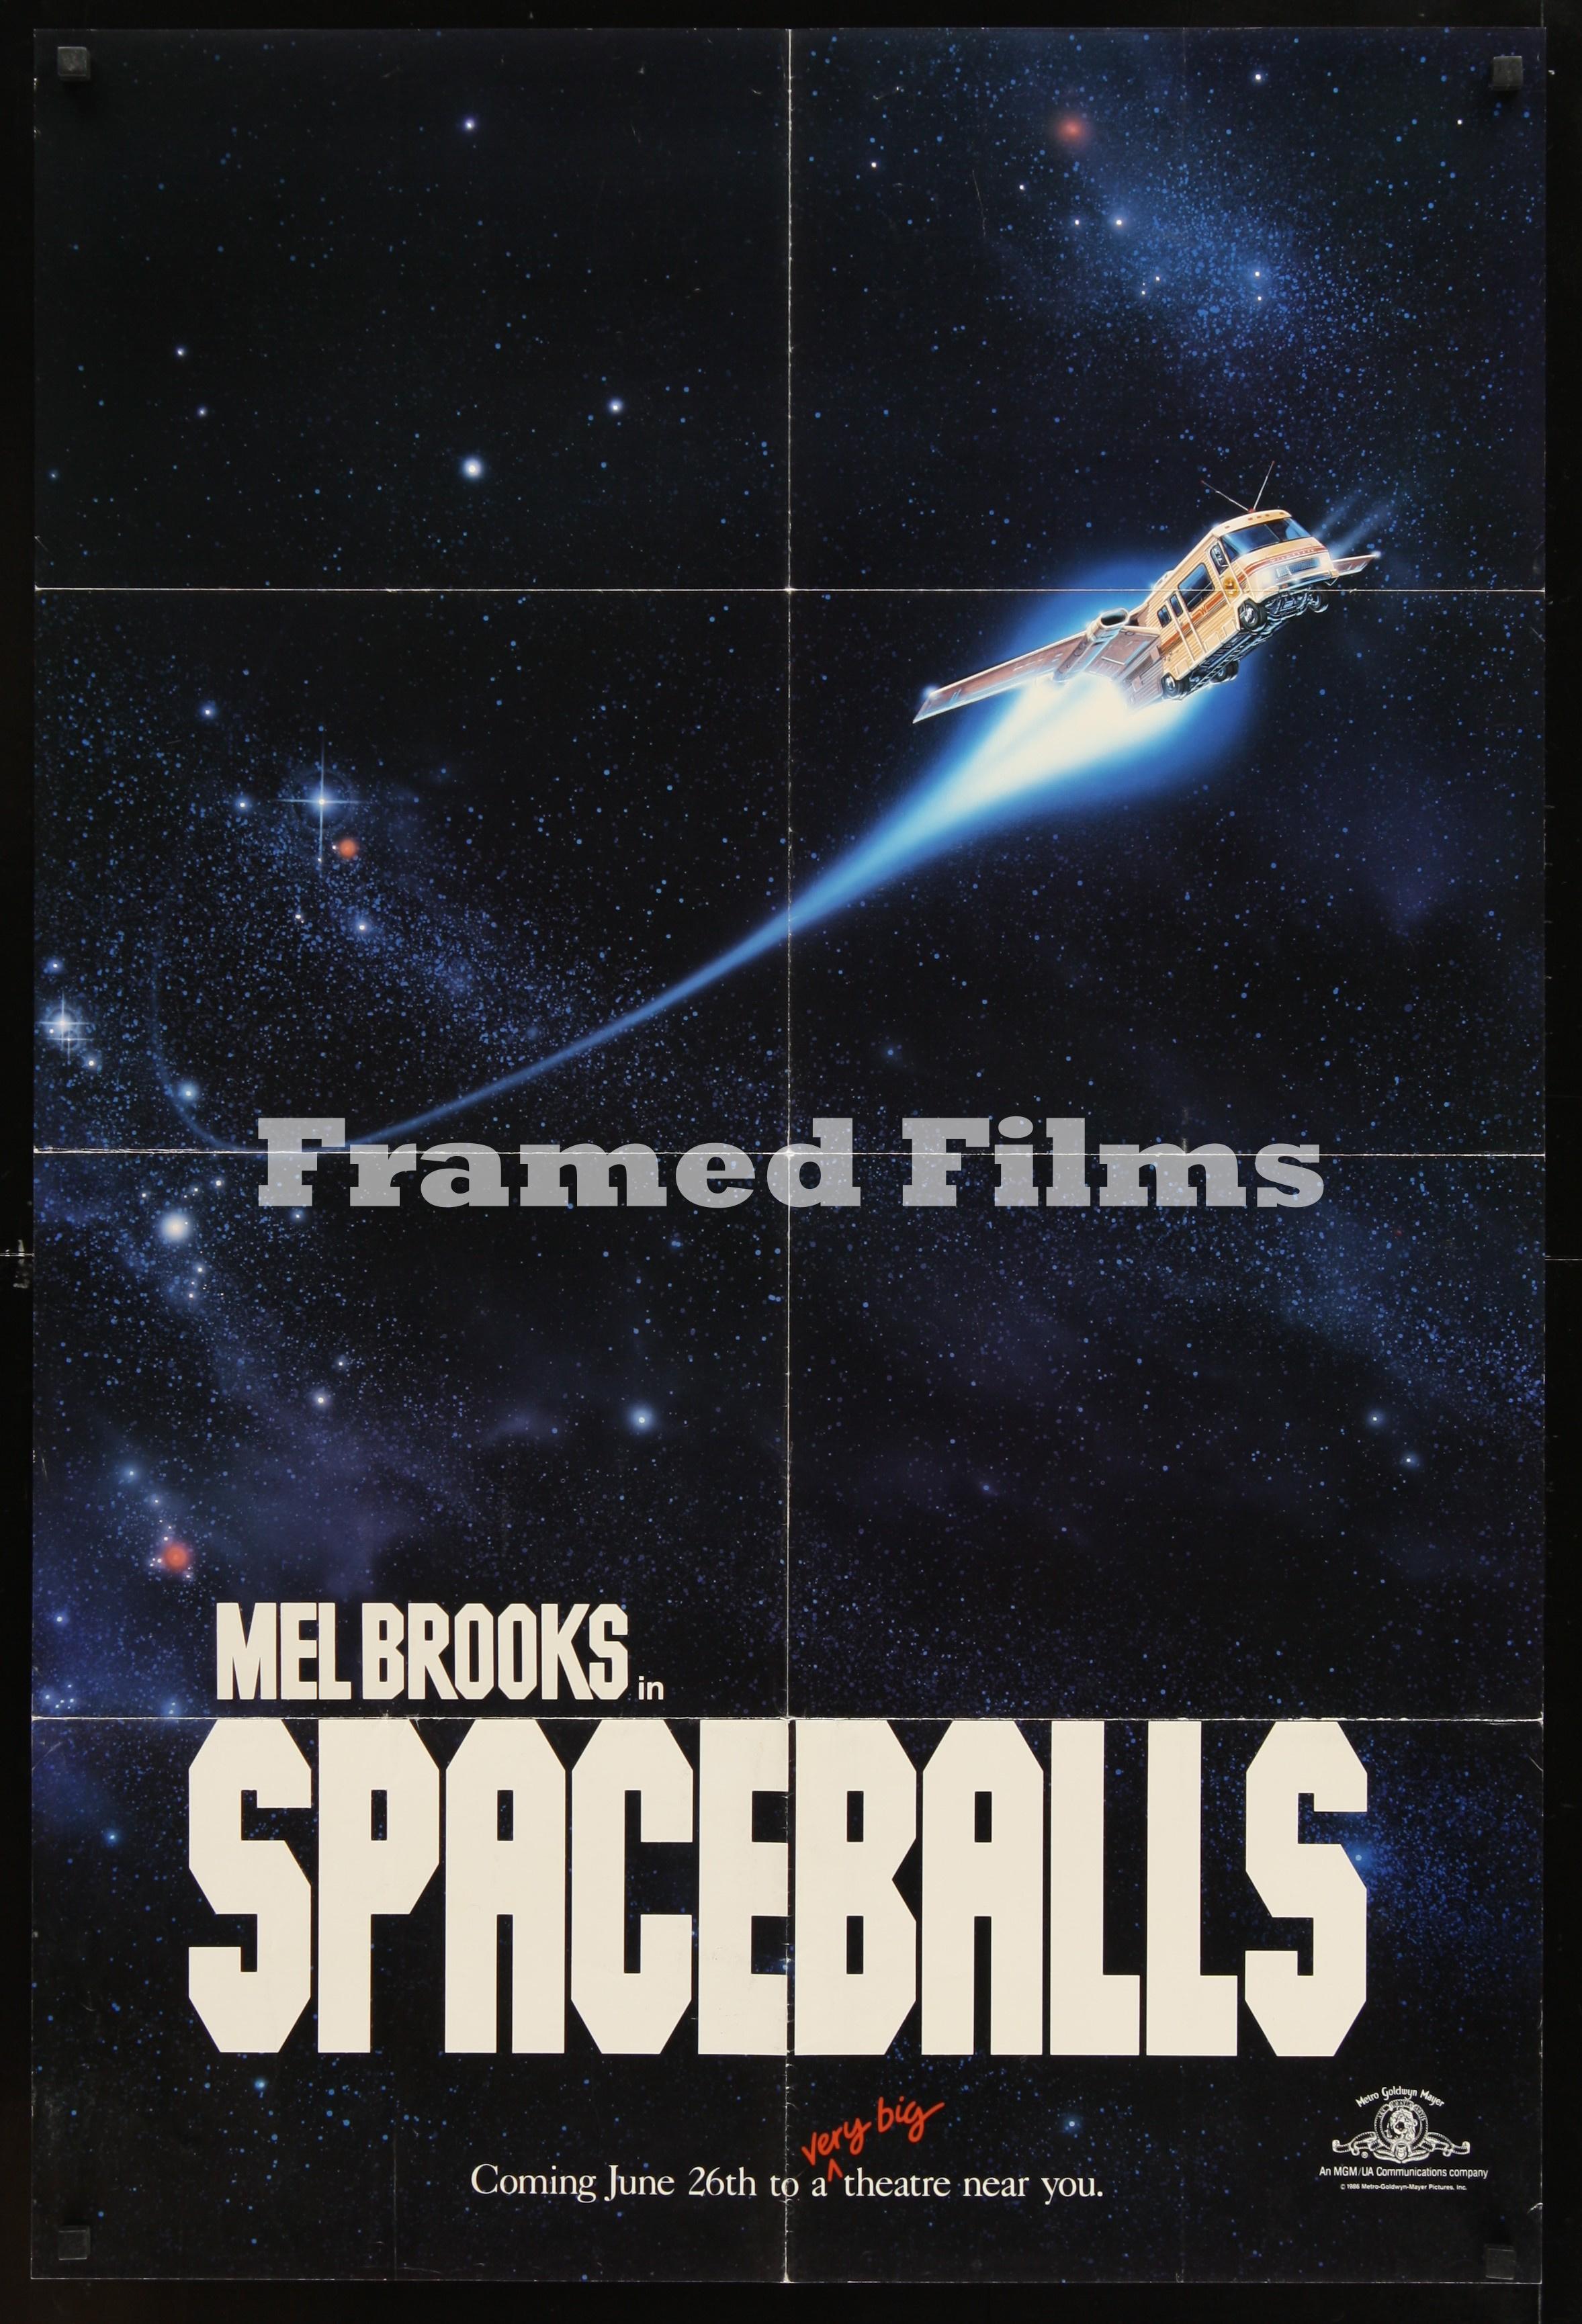 spaceballs_teaser_HP01179_L.jpg